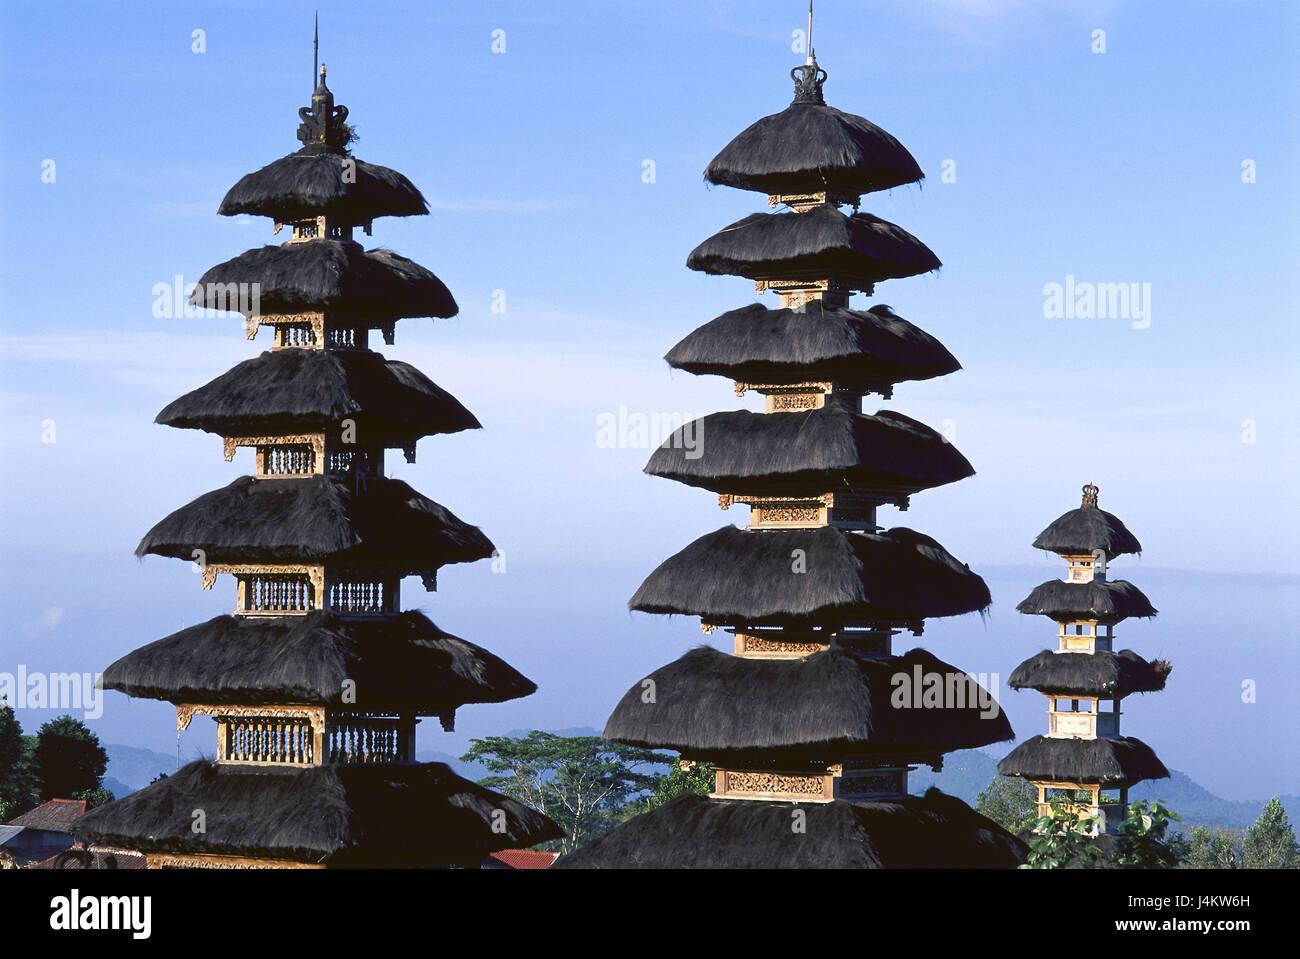 Indonesia, Bali, Pura Besakih, temple, detail Asia, South-East Asia, small Sundainseln, island, temple attachment, - Stock Image